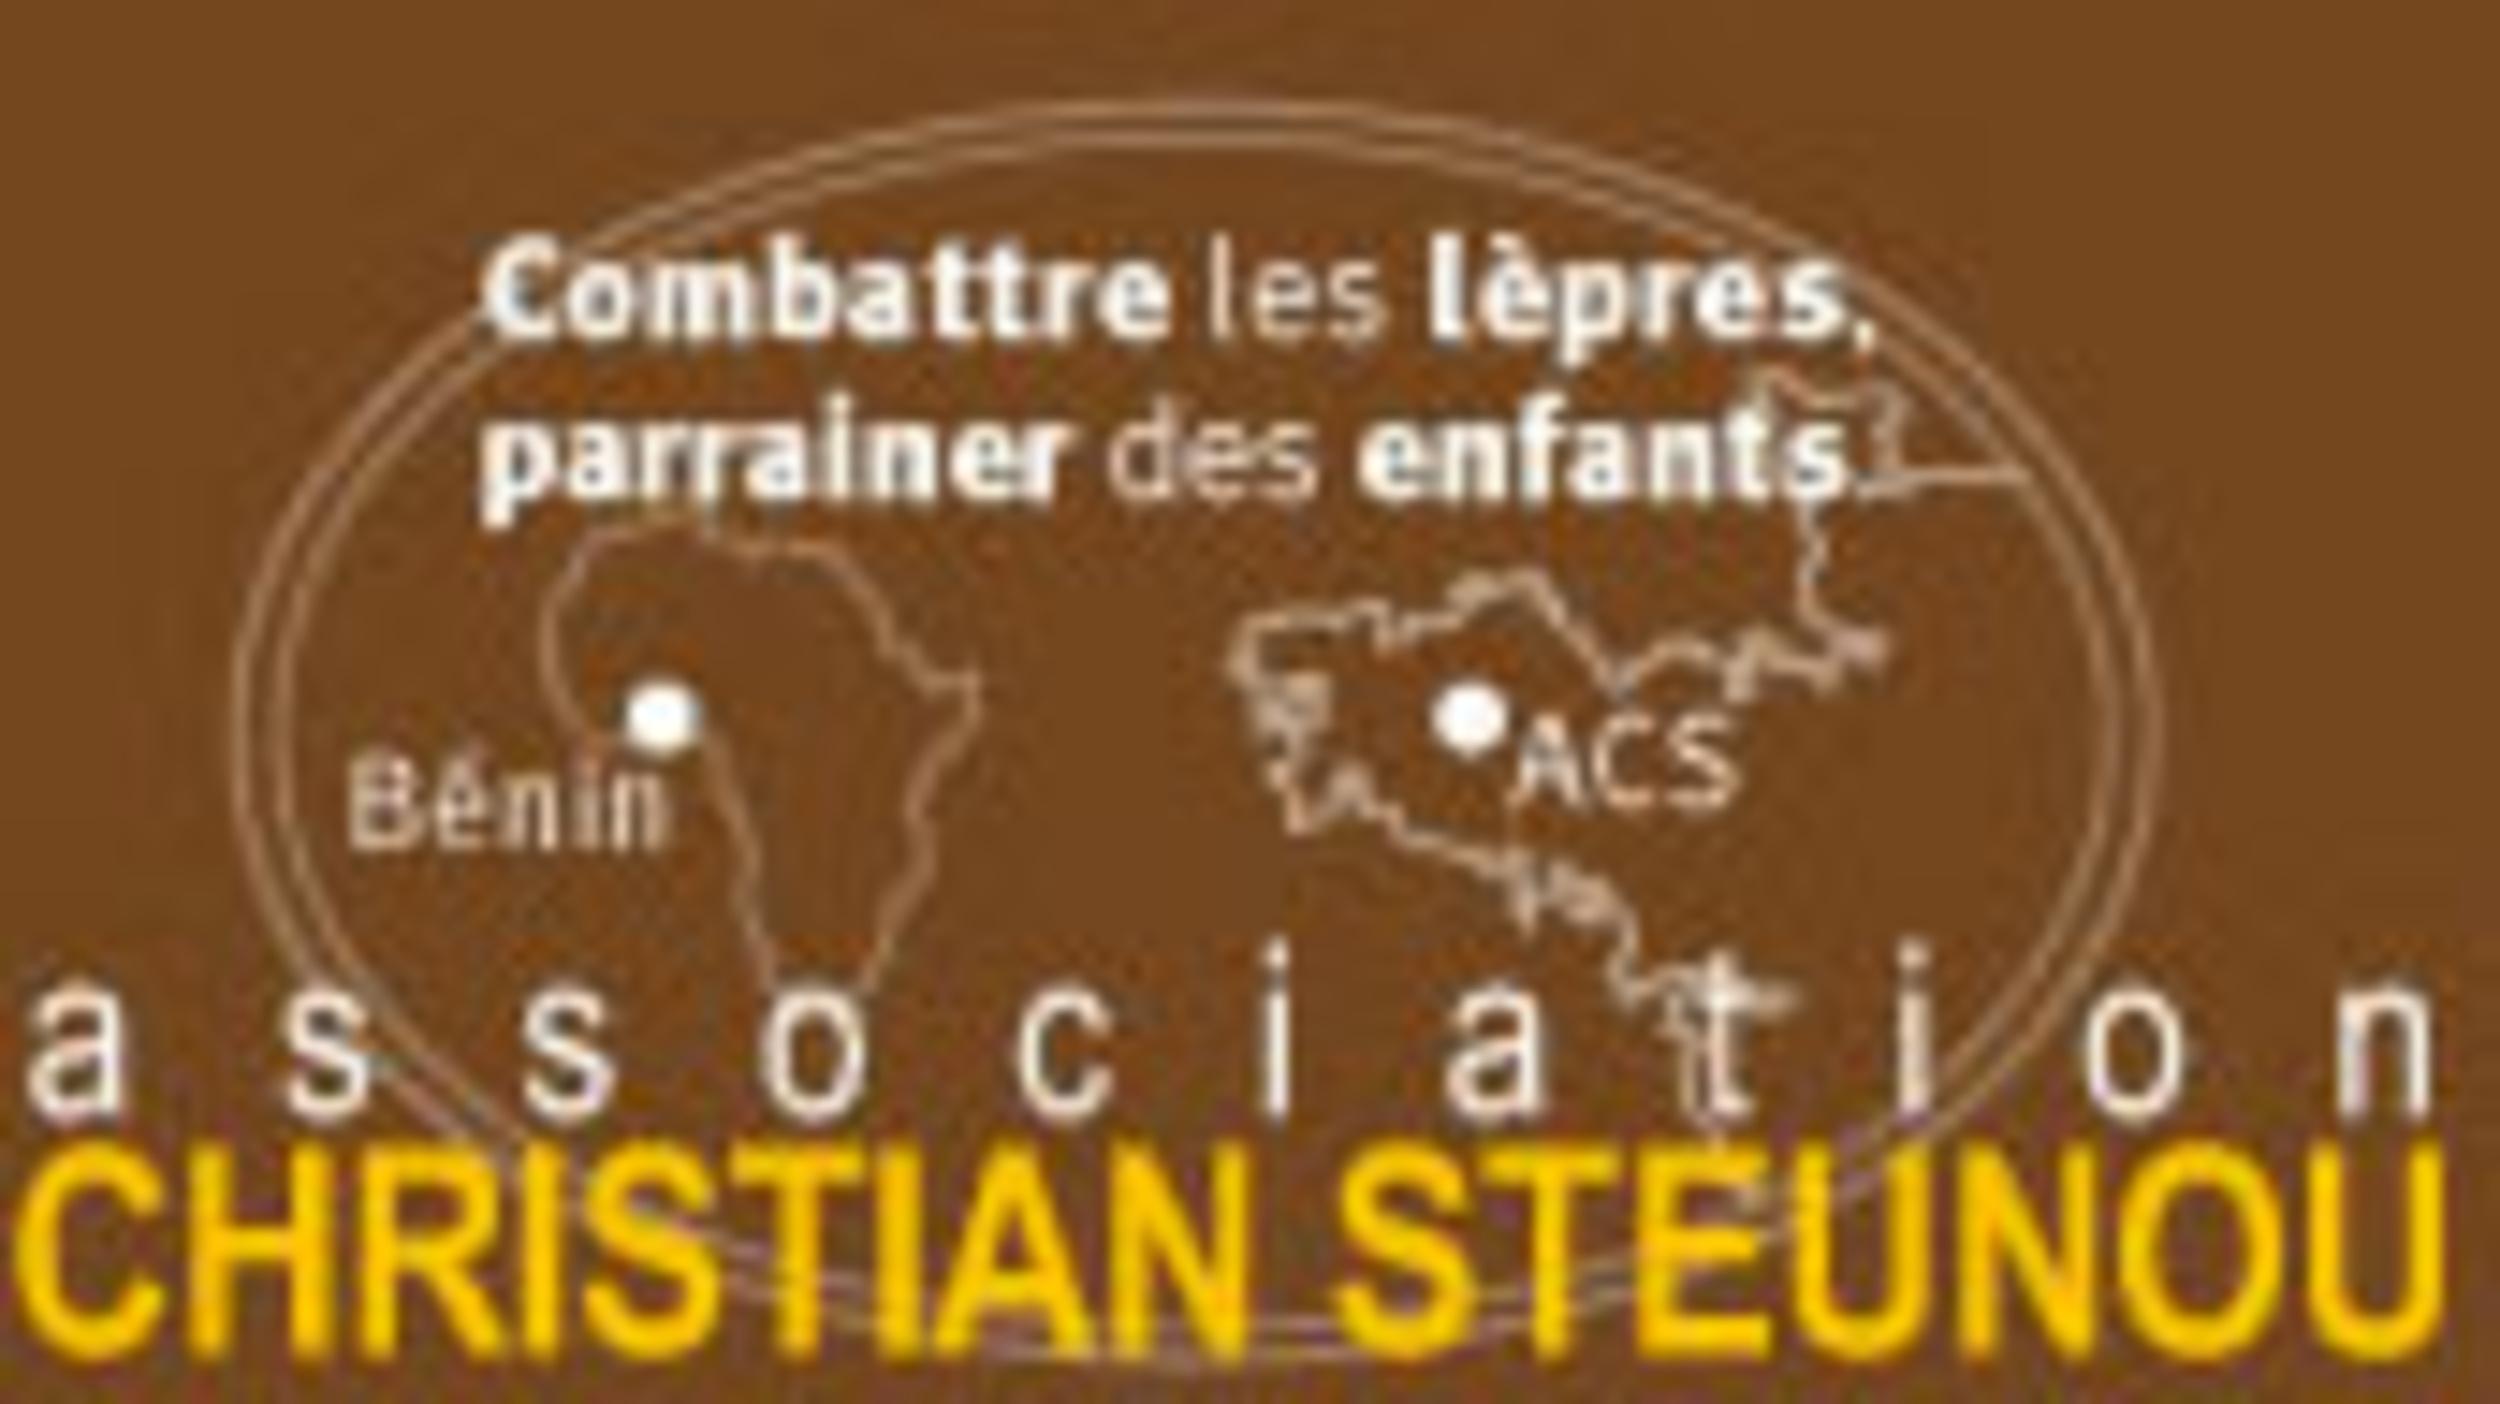 Association Christian STEUNOU - Corlay